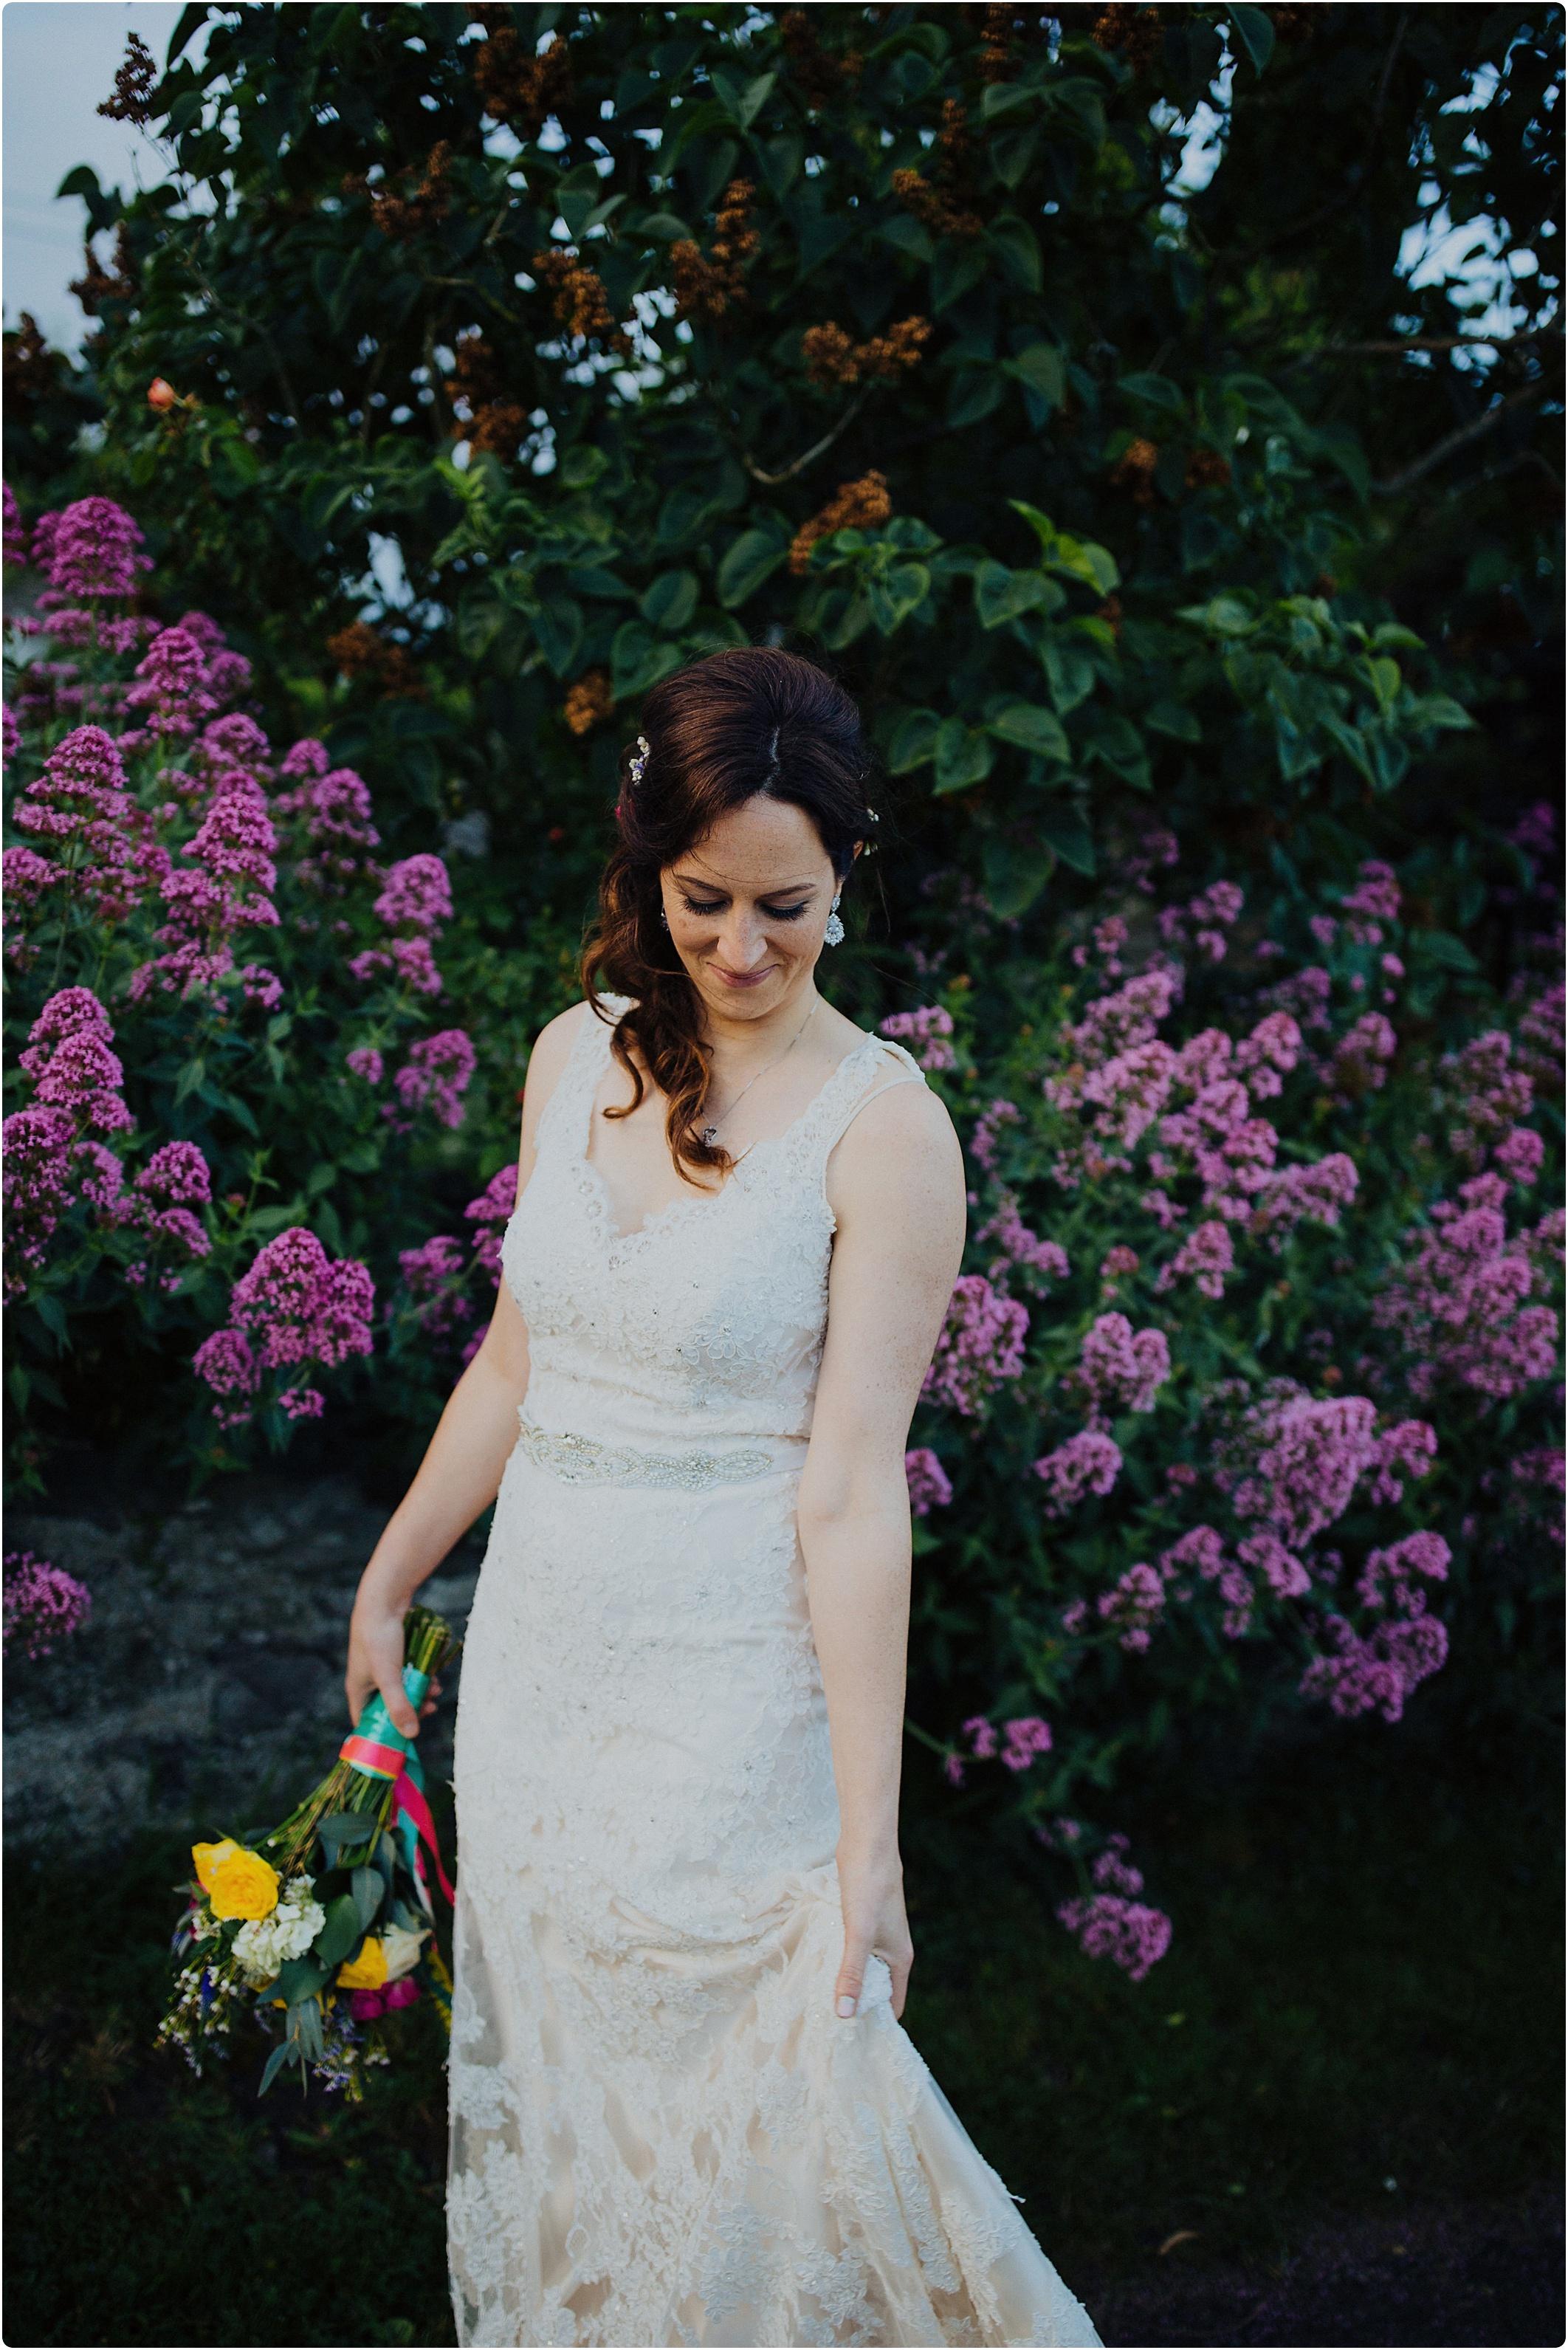 Treadam Barn Wedding rhododendron